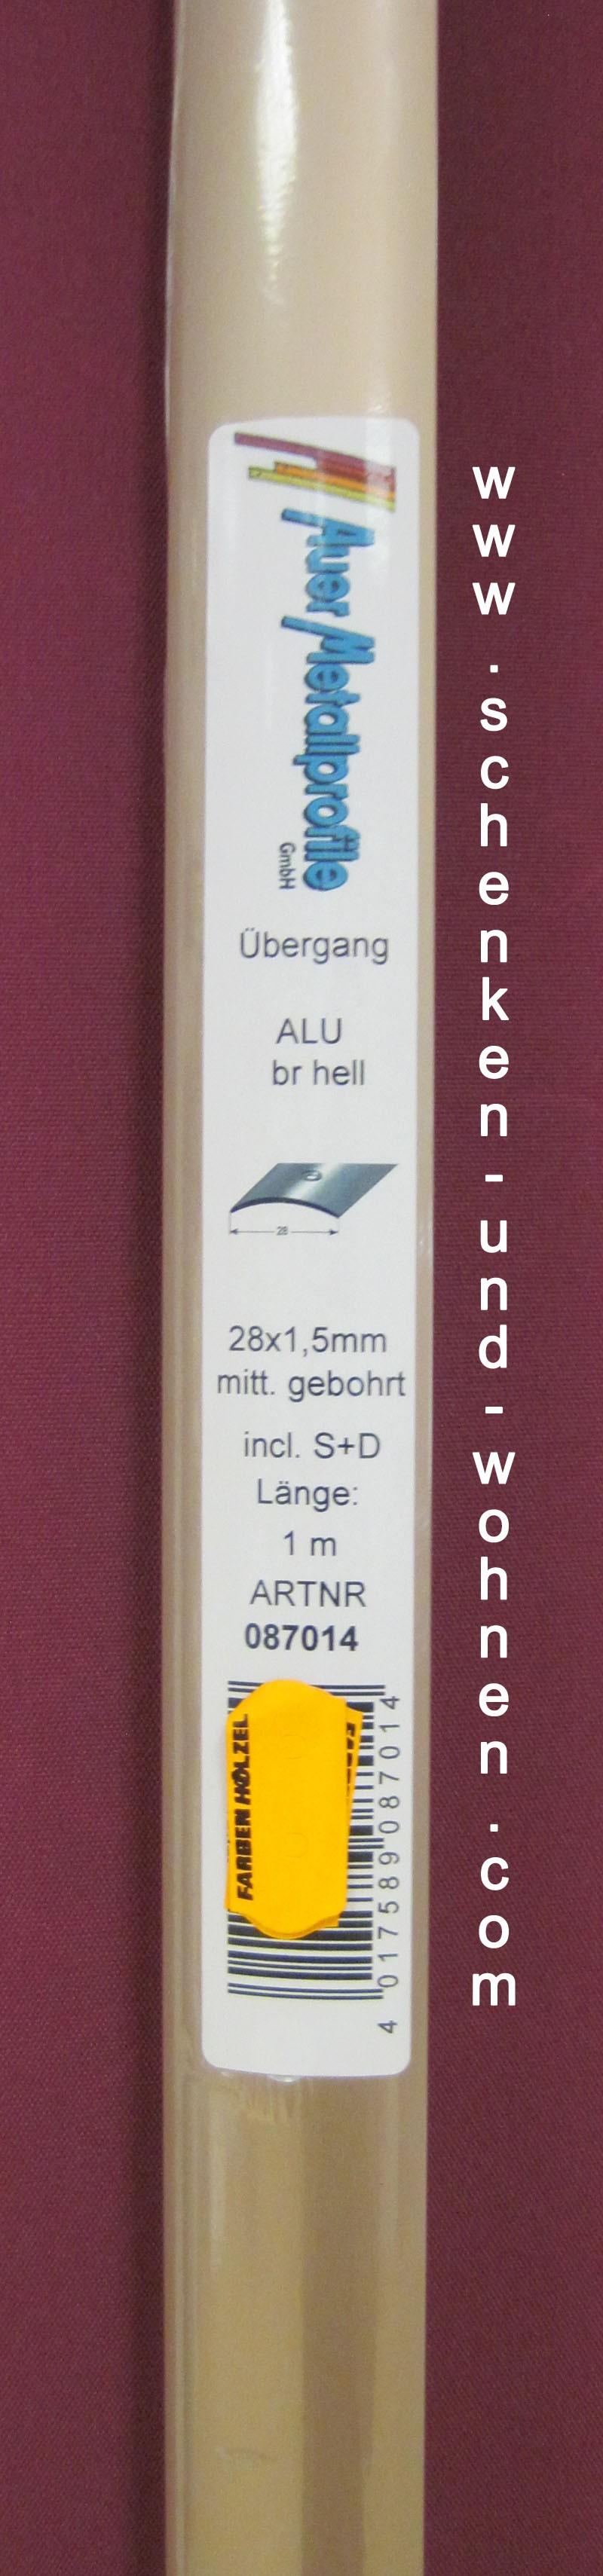 Übergangsprofil 28x1,5 mm 1,0 m bronze hell gebohrt